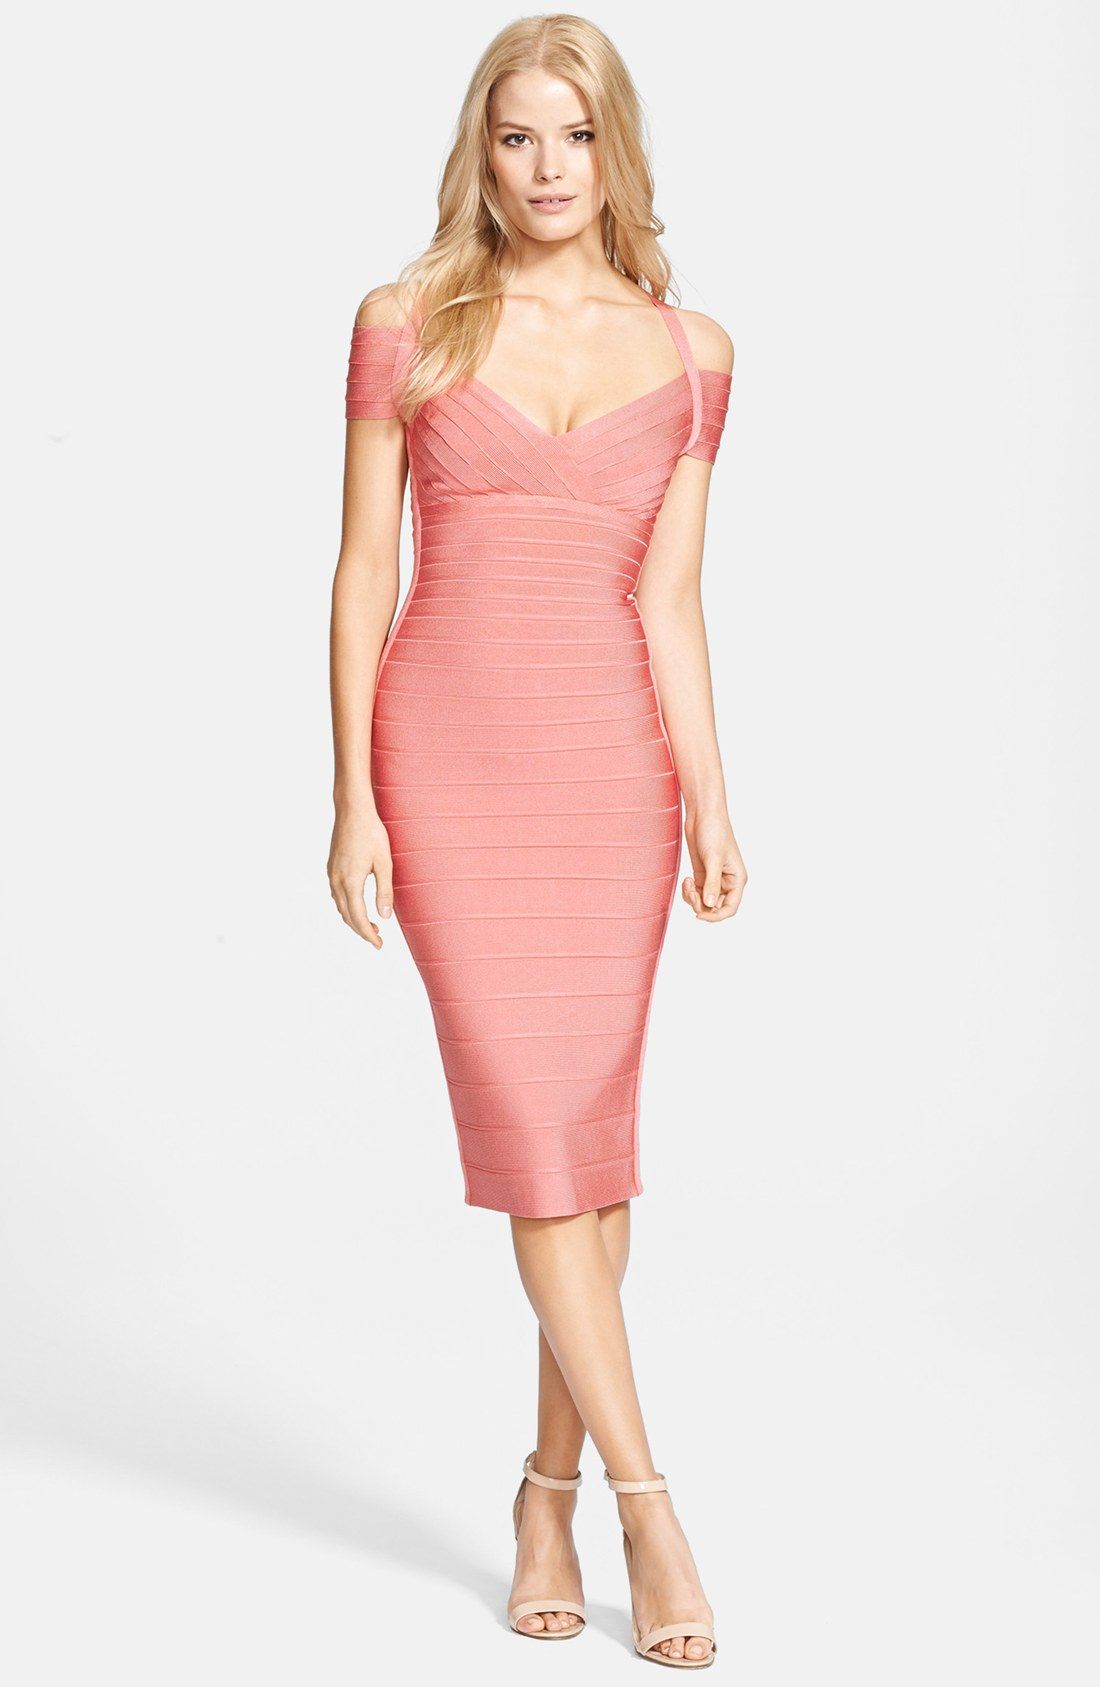 Pink Bandage Dresses